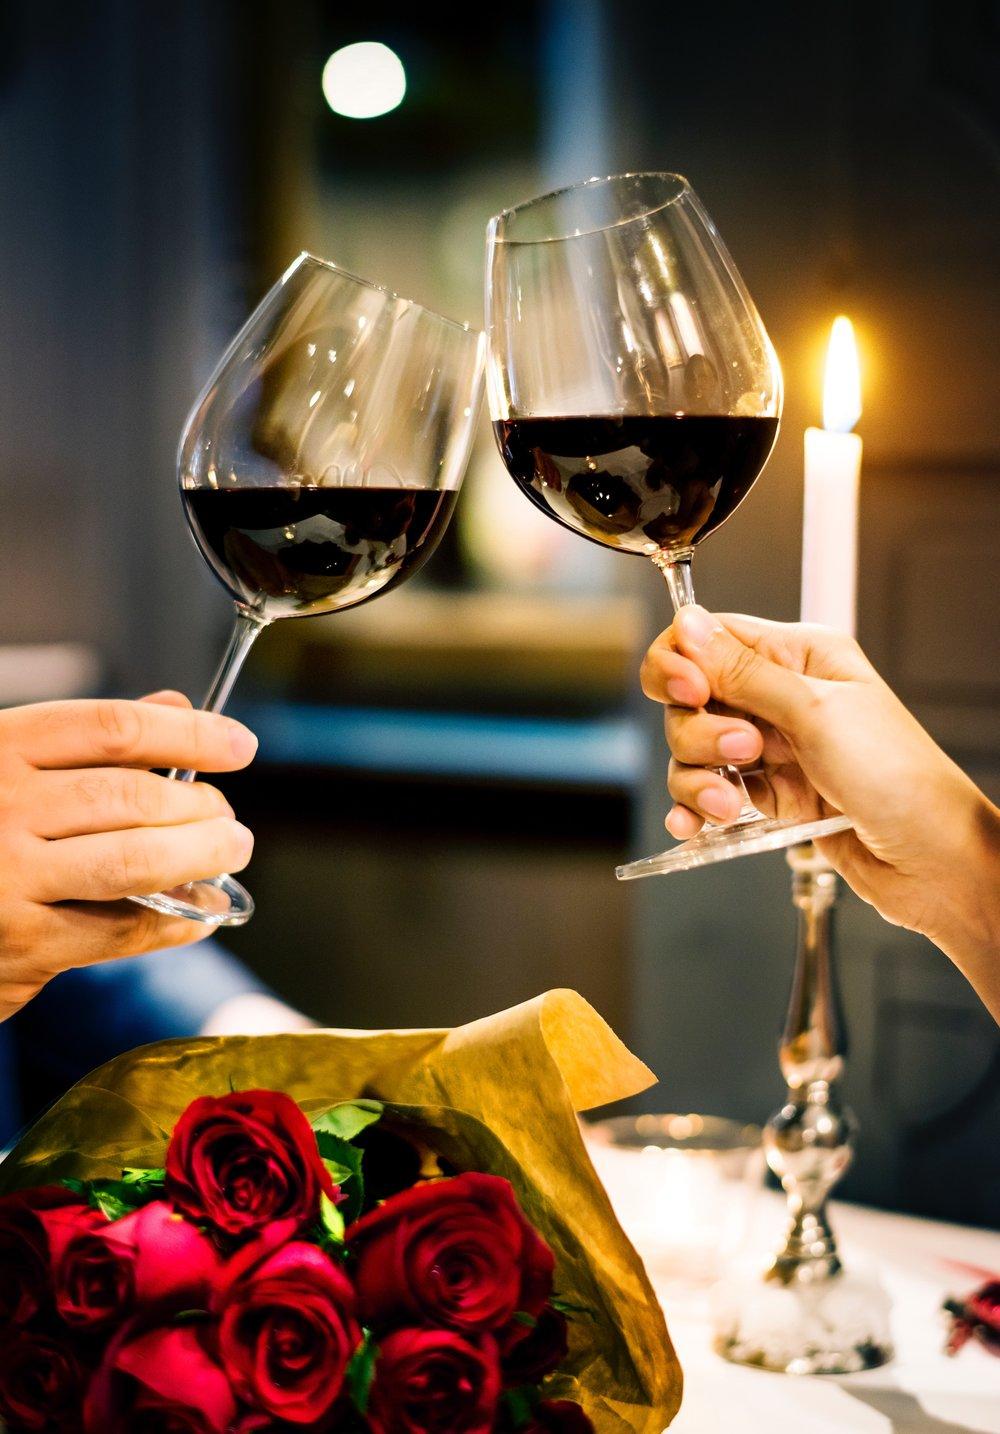 alcoholic-beverage-anniversary-bar-1246956.jpg